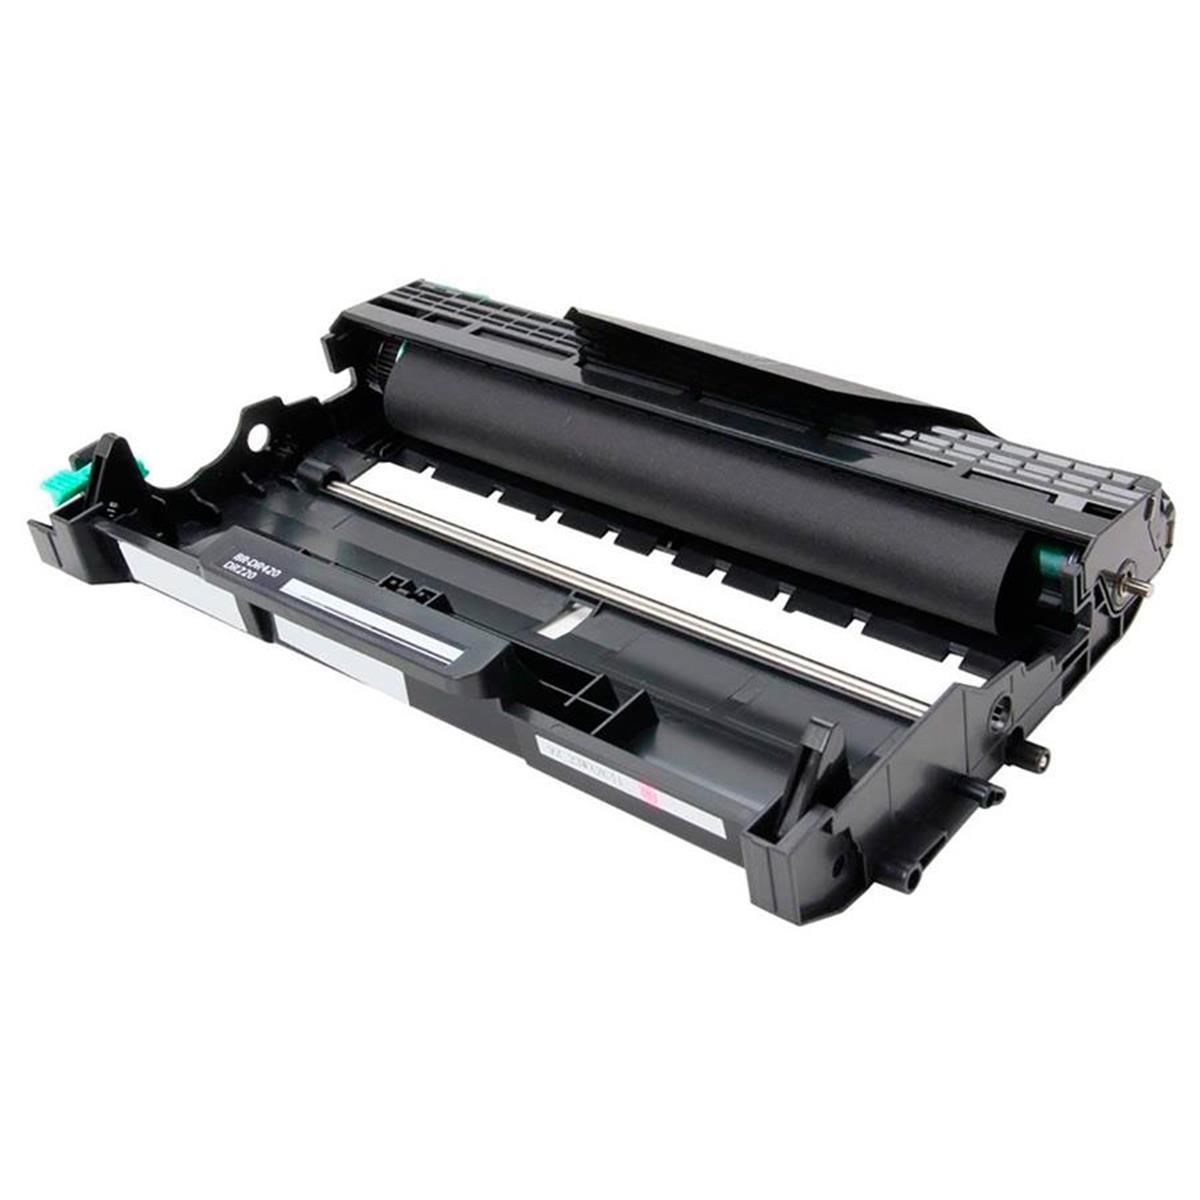 Fotocondutor Compativel DR2340 - TN2340 TN2370 TN2740 - DCP2540 DCP2600 5J-5O3S-1PZT